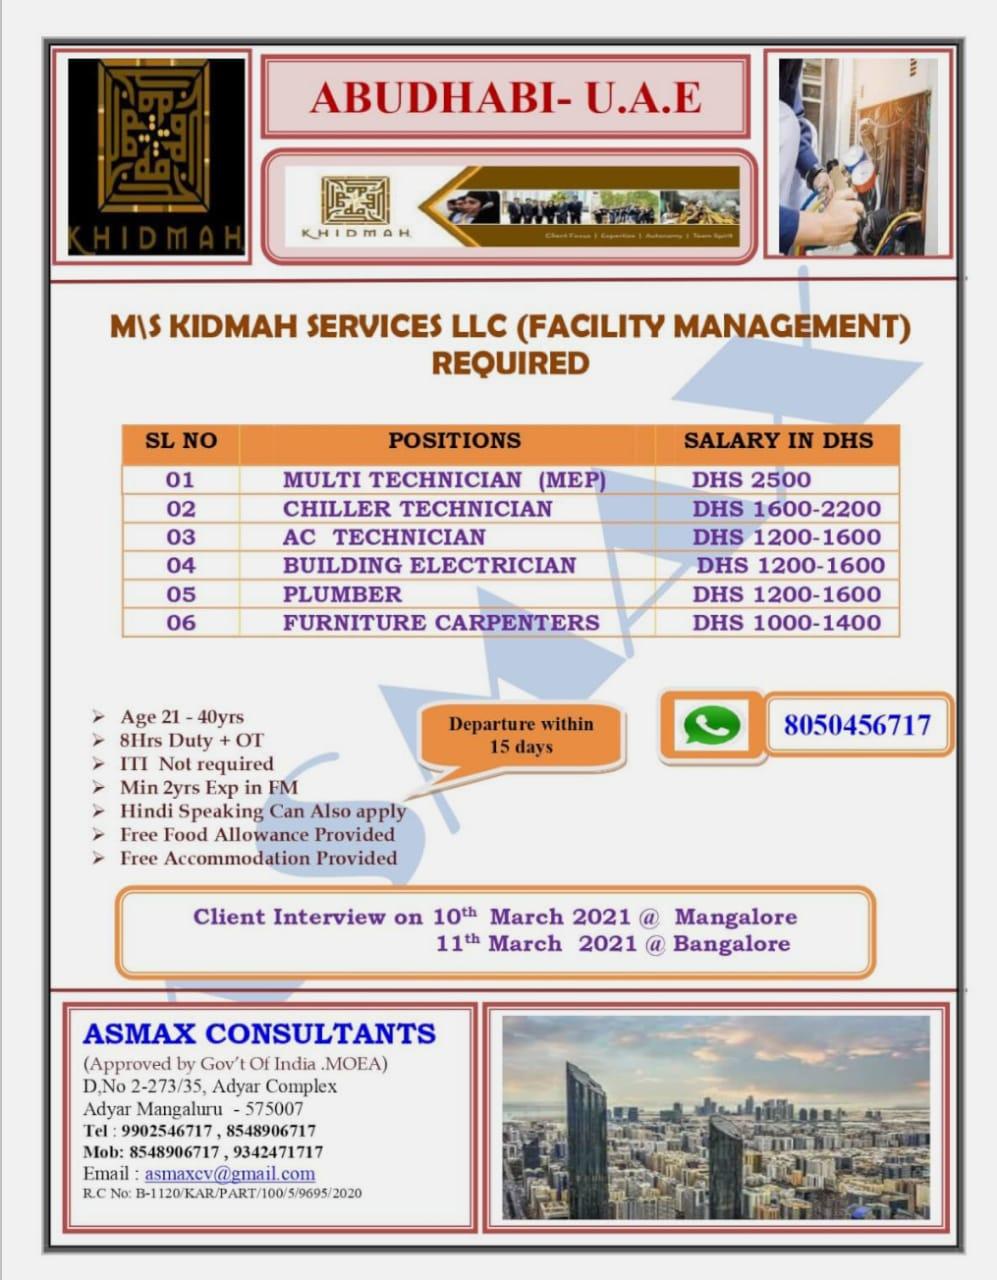 M/S KIDMAH SERVICES LLC (FACILITY MANAGEMENT)  REQUIRED ABUDHABI UAE